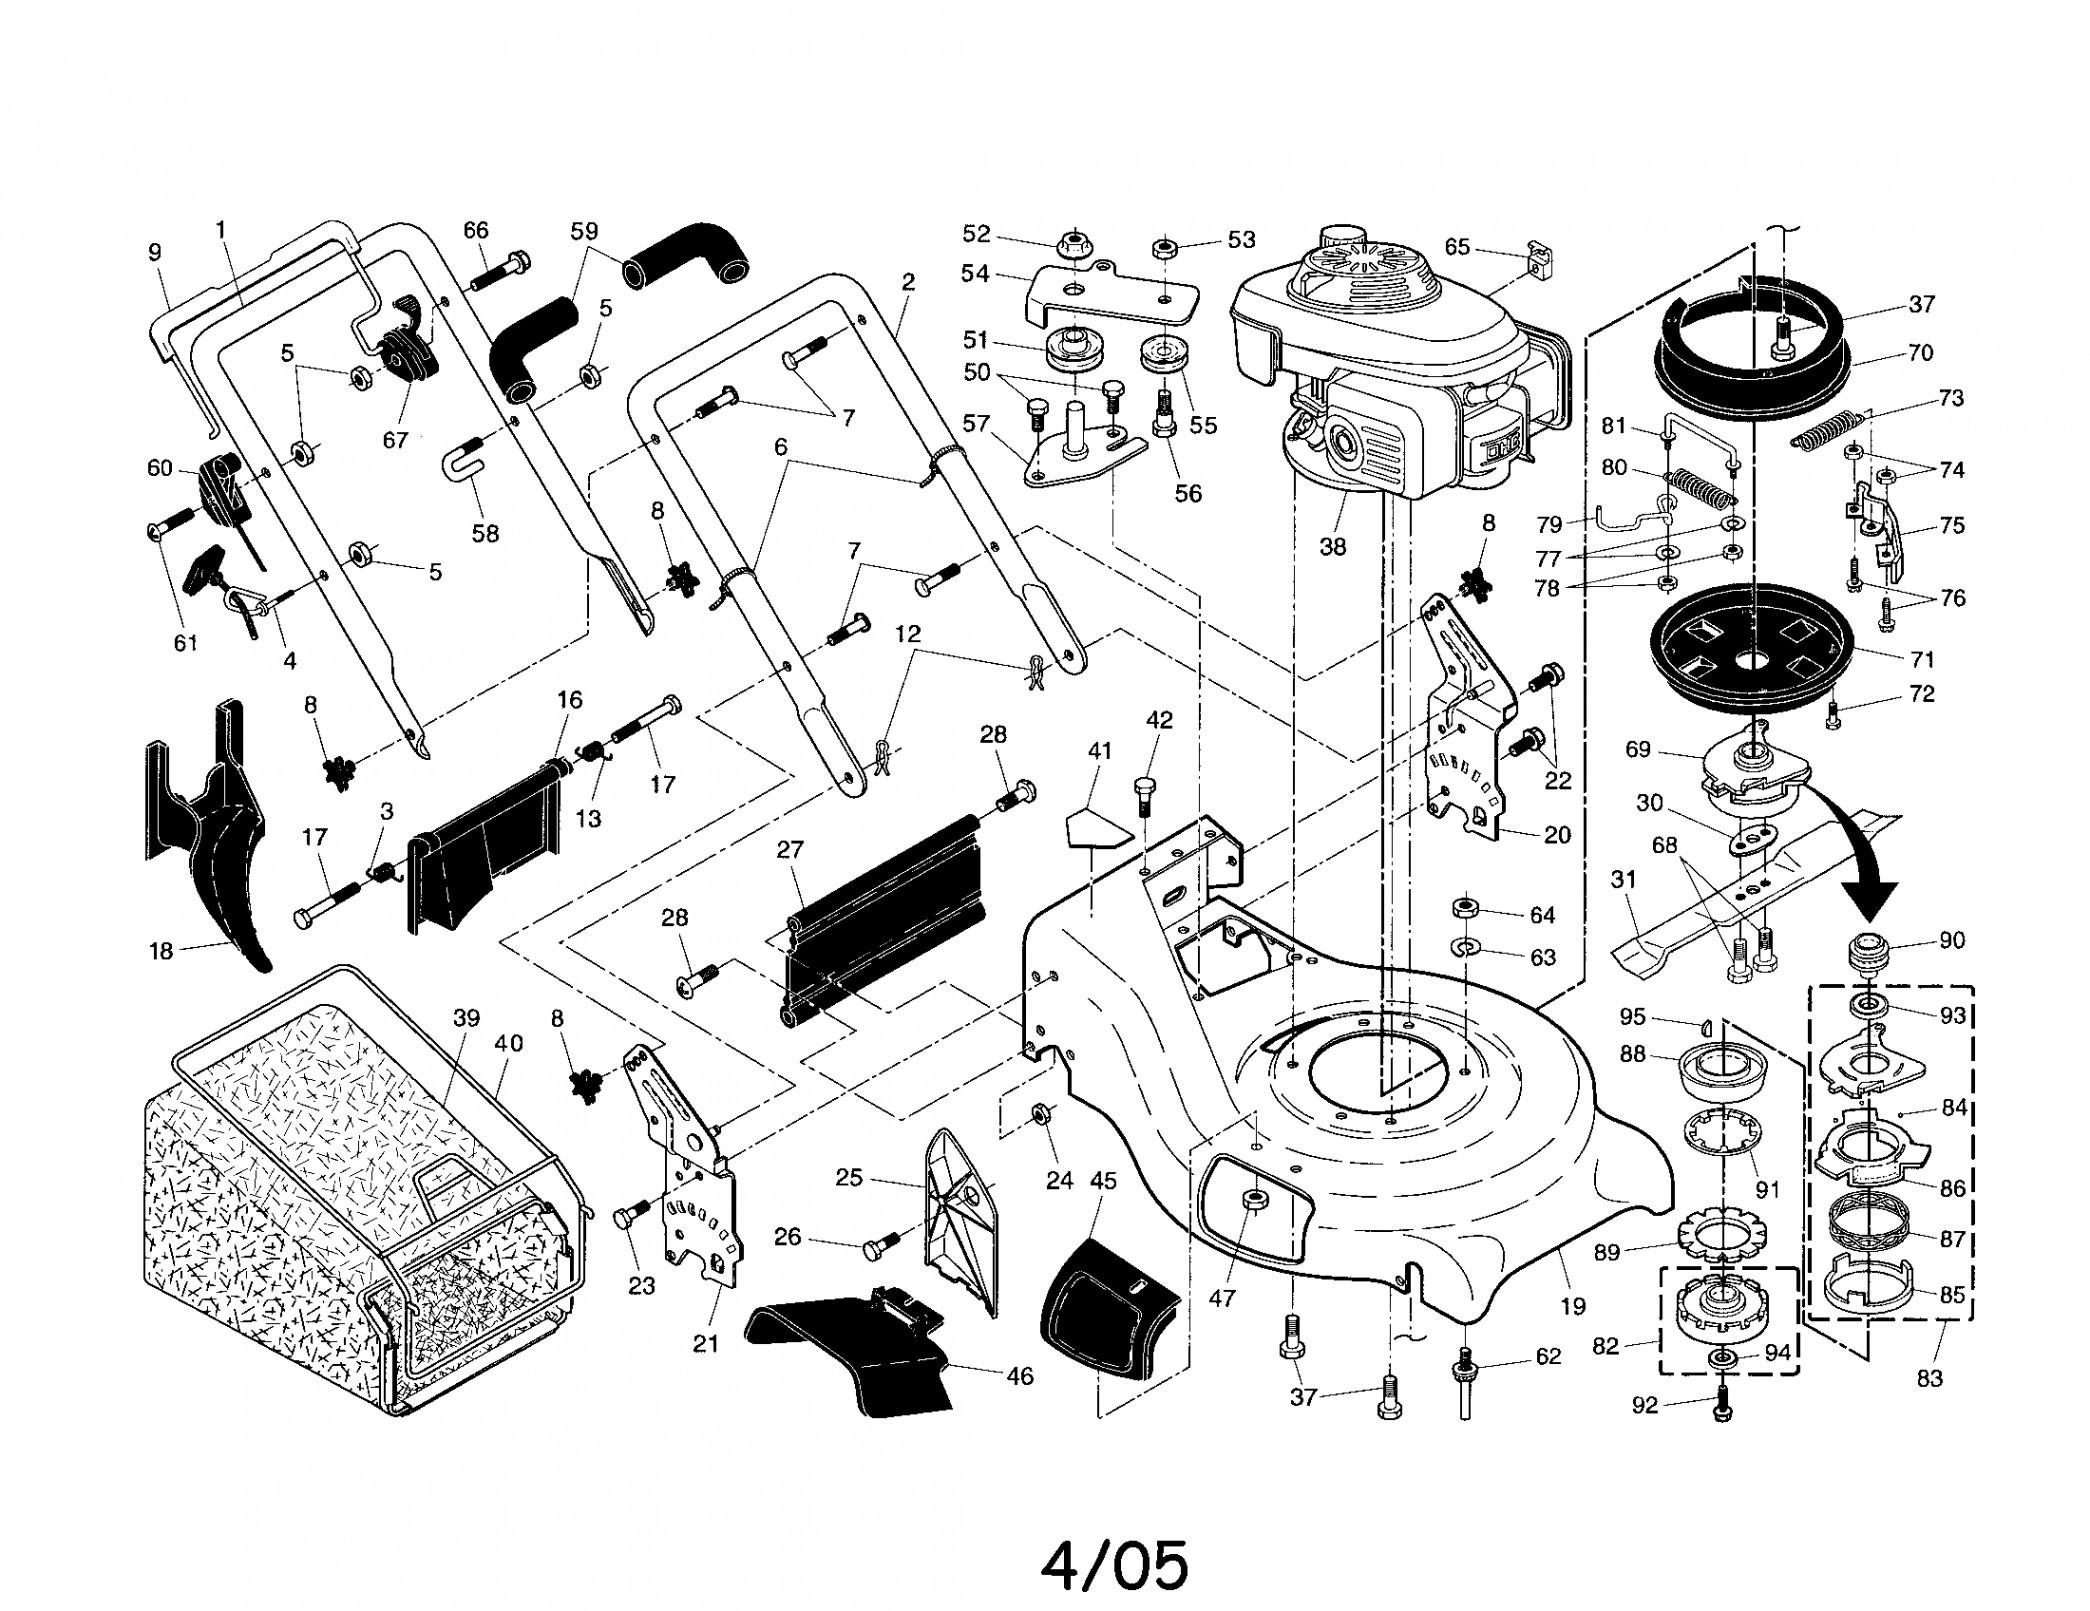 Honda Lawn Mower Parts Diagram 40 Fresh Honda Hrx Lawn Mower Of Honda Lawn Mower Parts Diagram